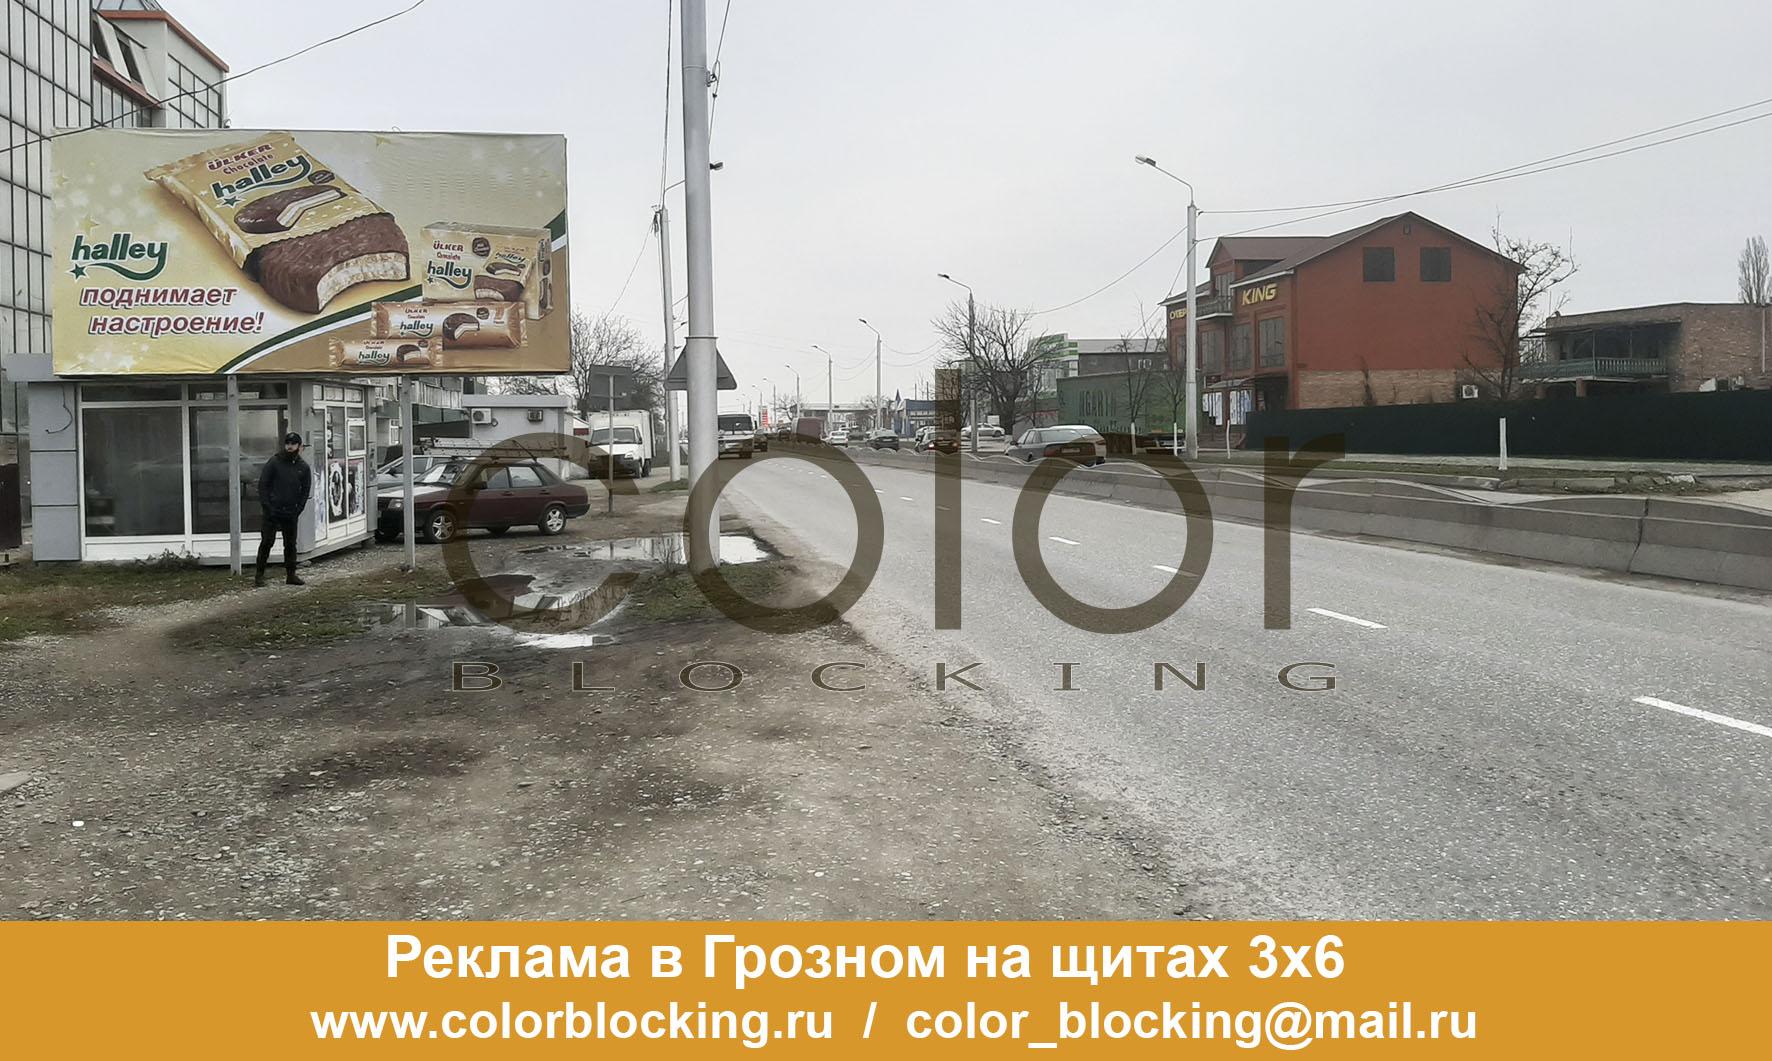 Реклама в Грозном на щитах 3х6 трасса